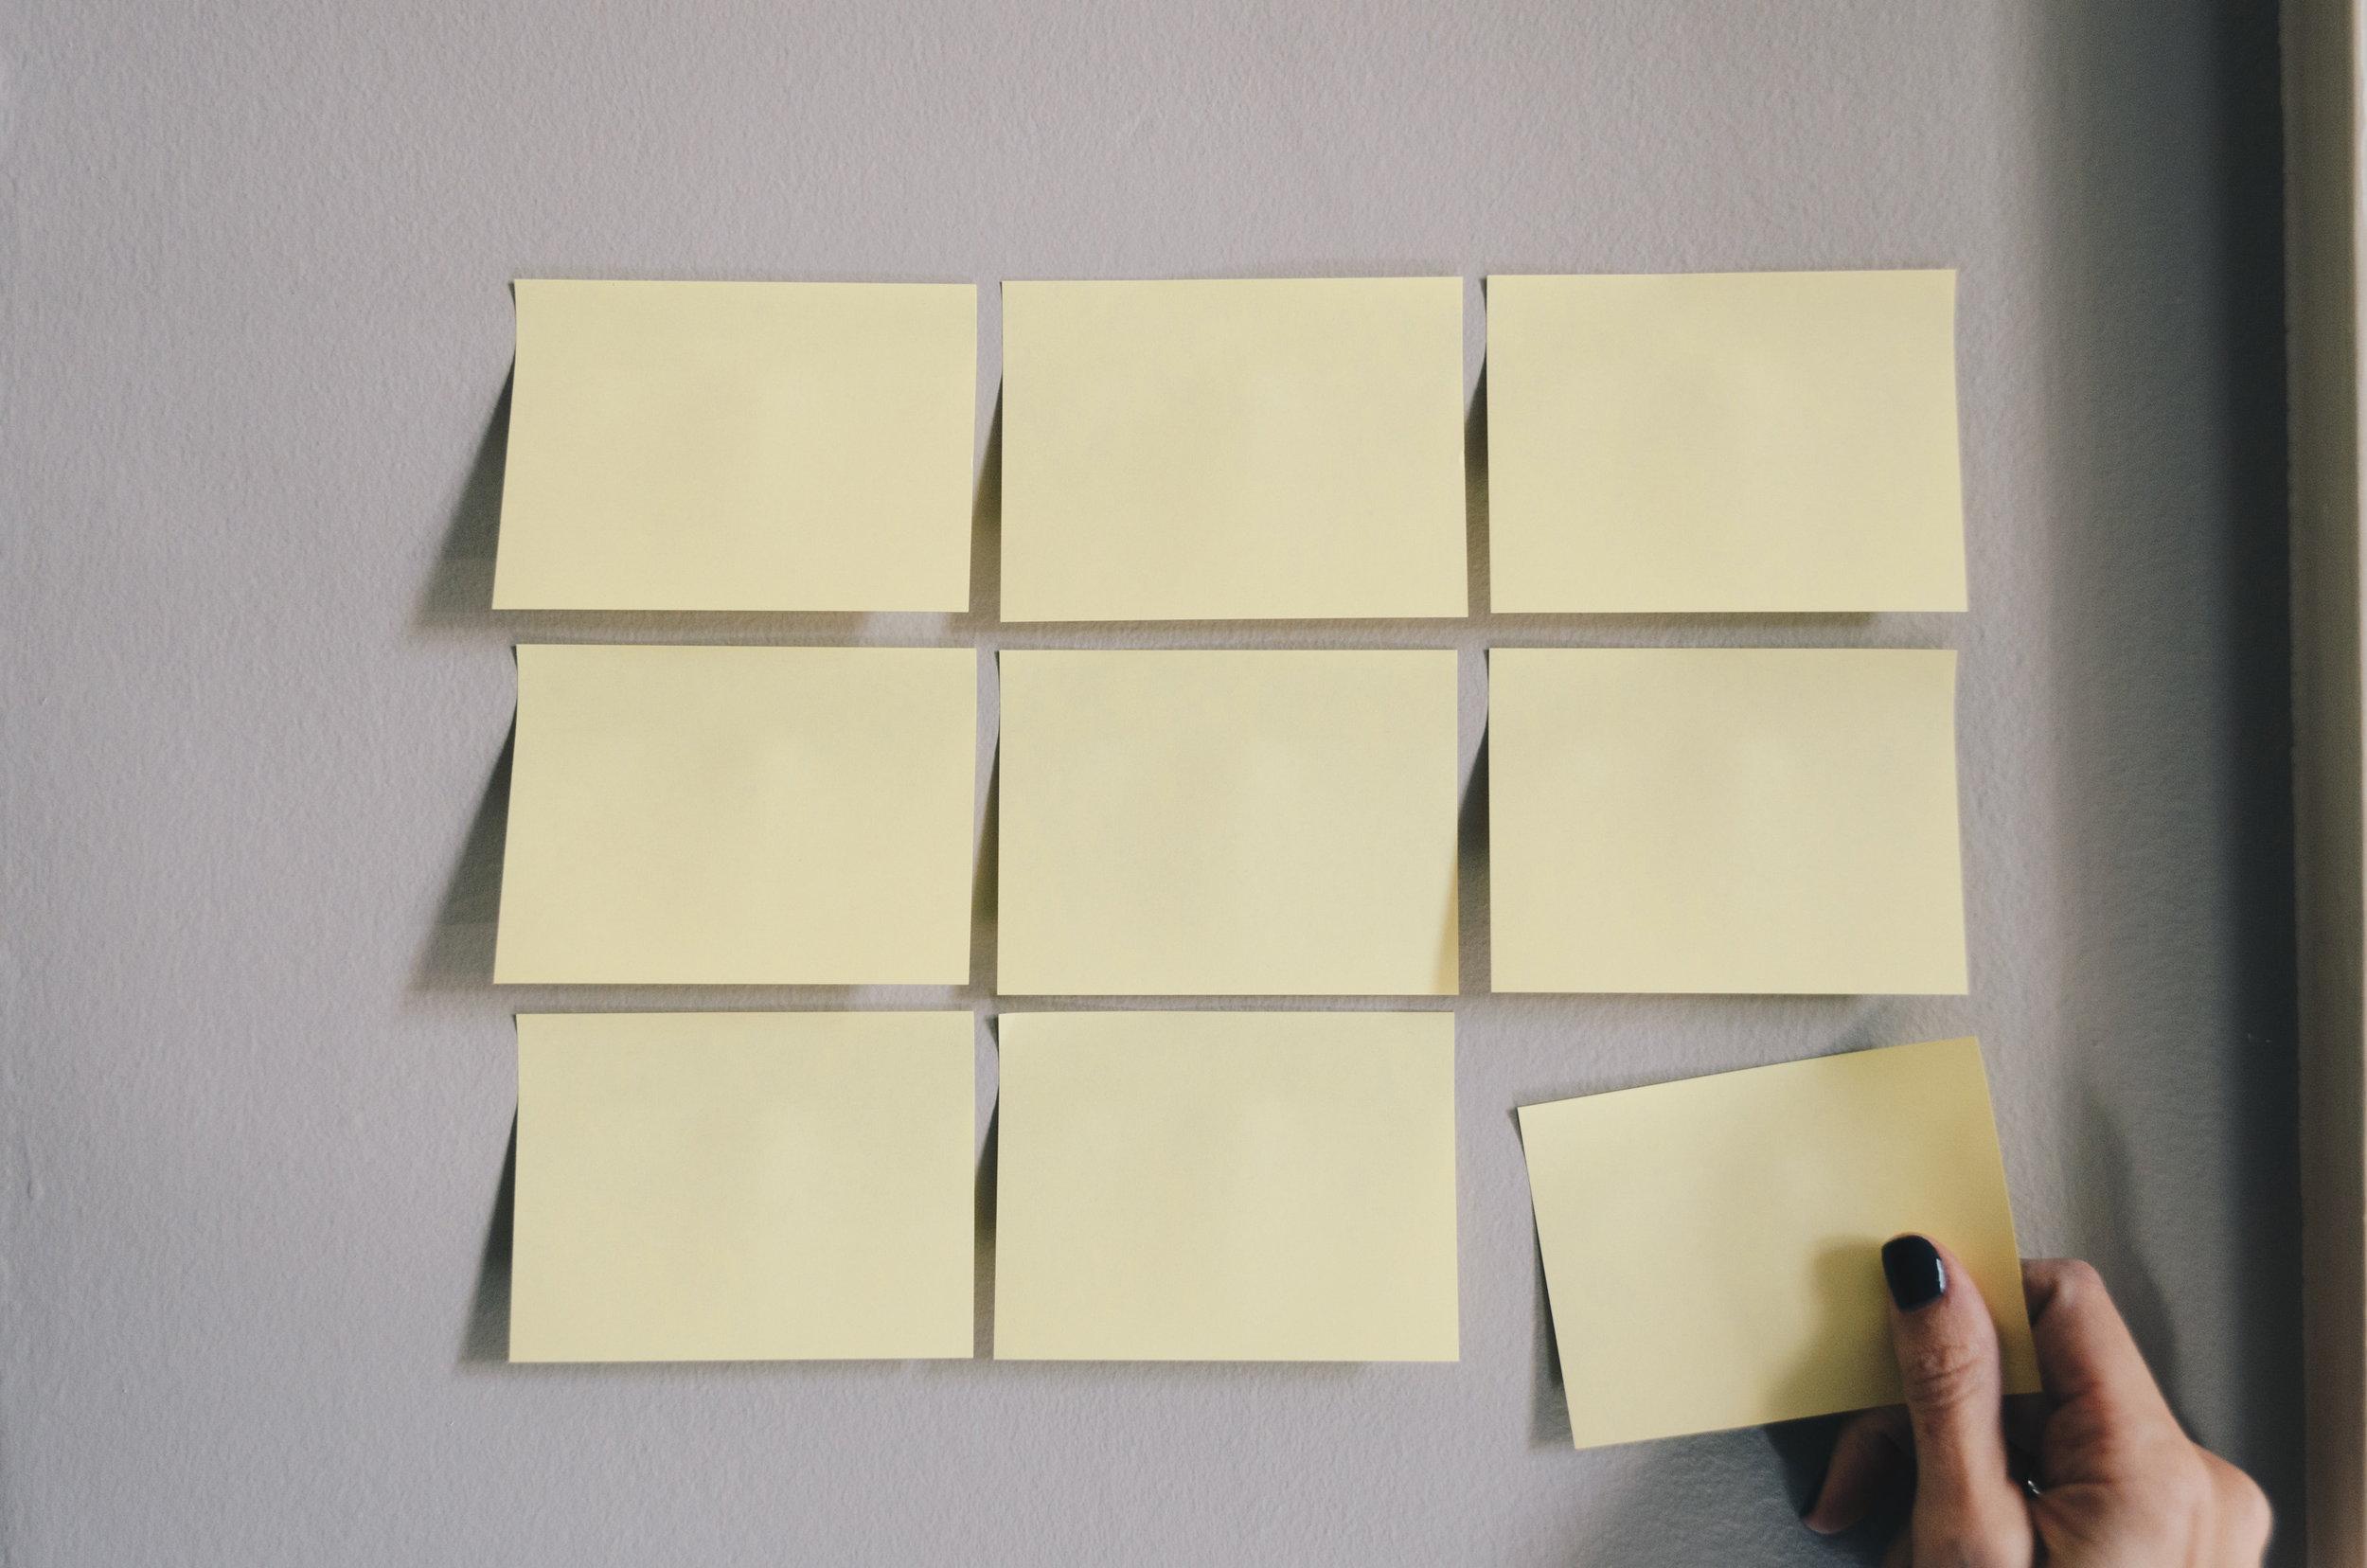 Archisoup-architecture-site-analysis-checklist.jpg